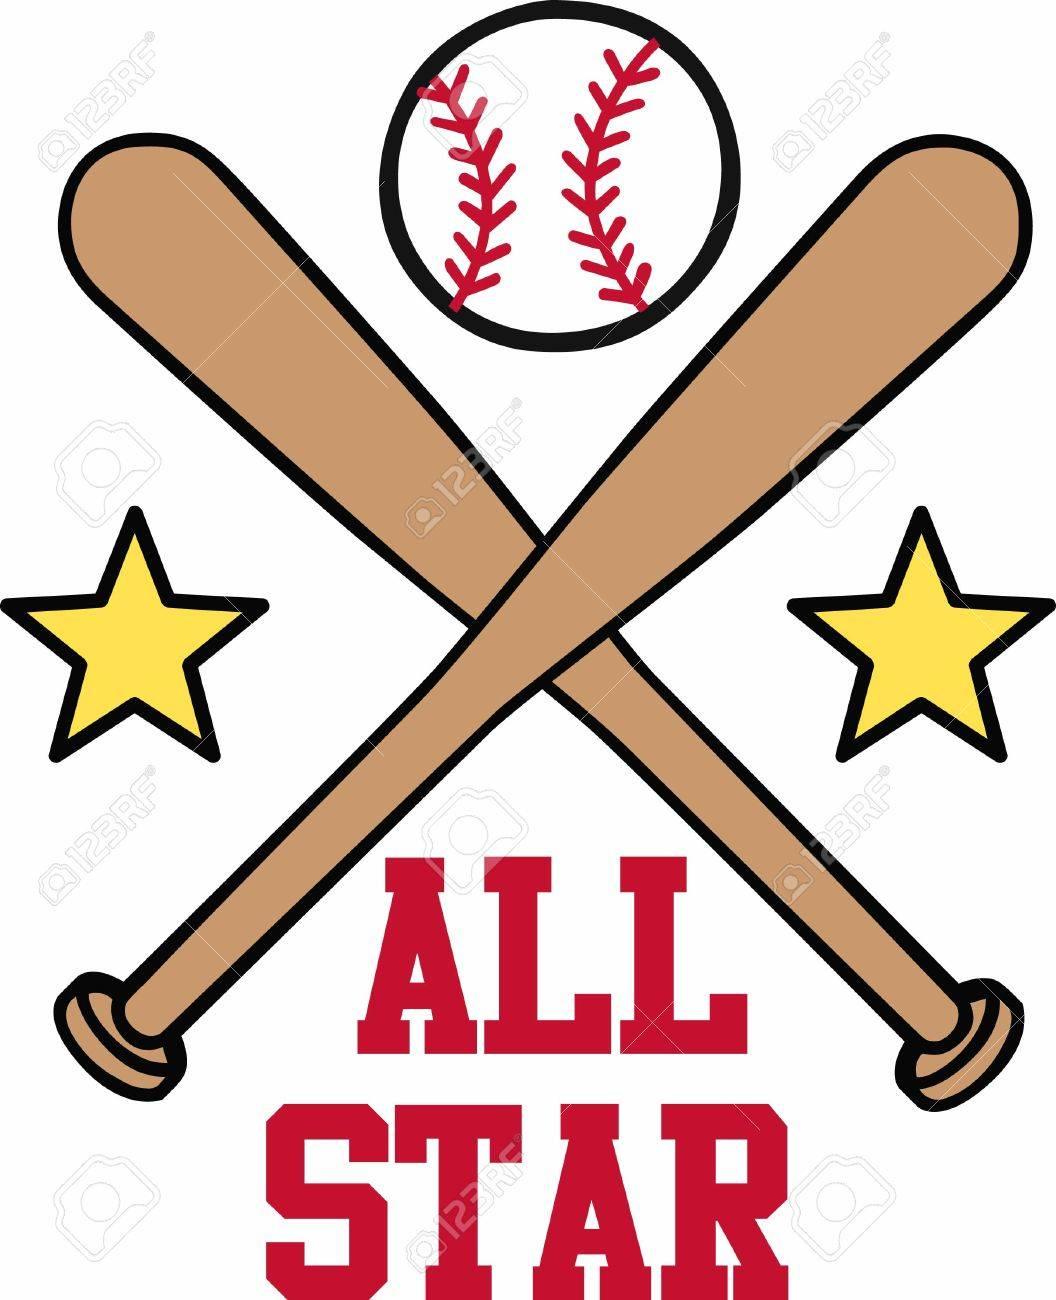 crossed baseball bats with yellow stars and a ball on top logo rh 123rf com Small Leather Baseball's baseball bat and ball logo